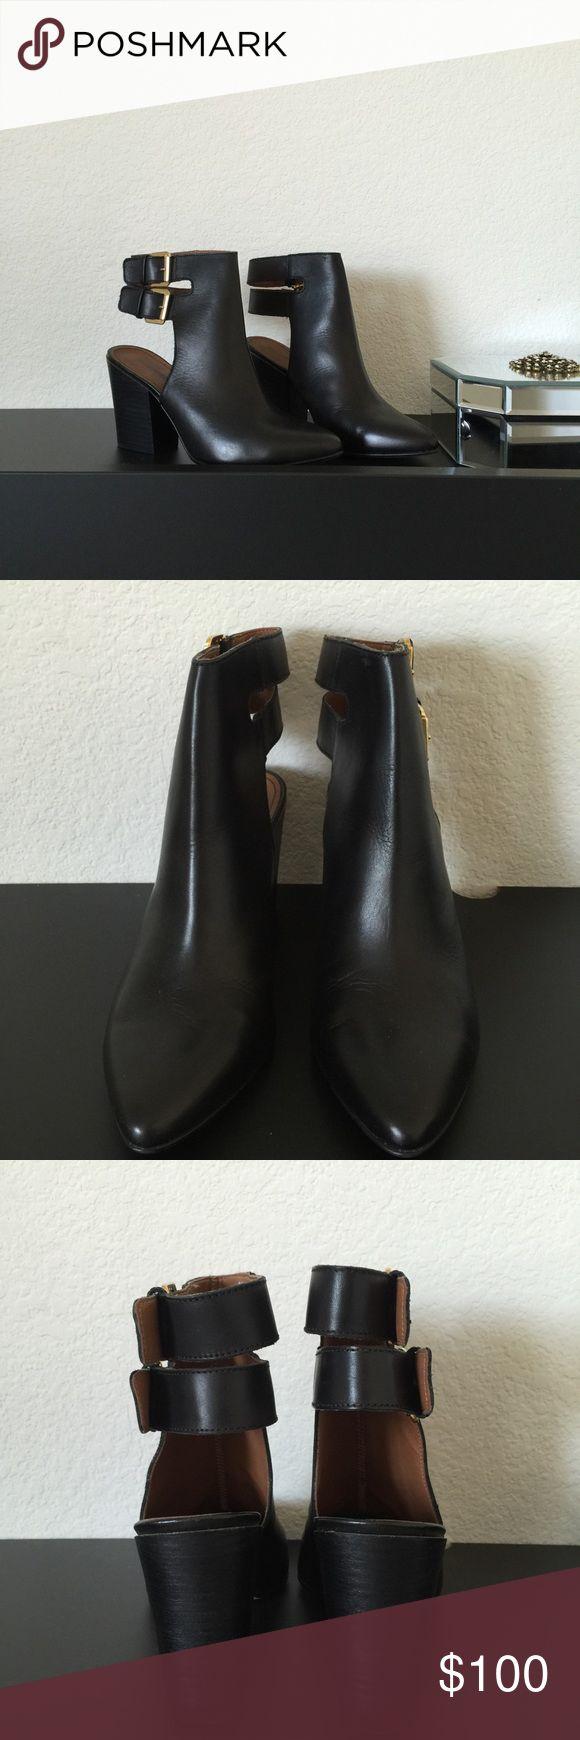 Leather Accent Tag - Muah by VIDA VIDA ZOOIZhL